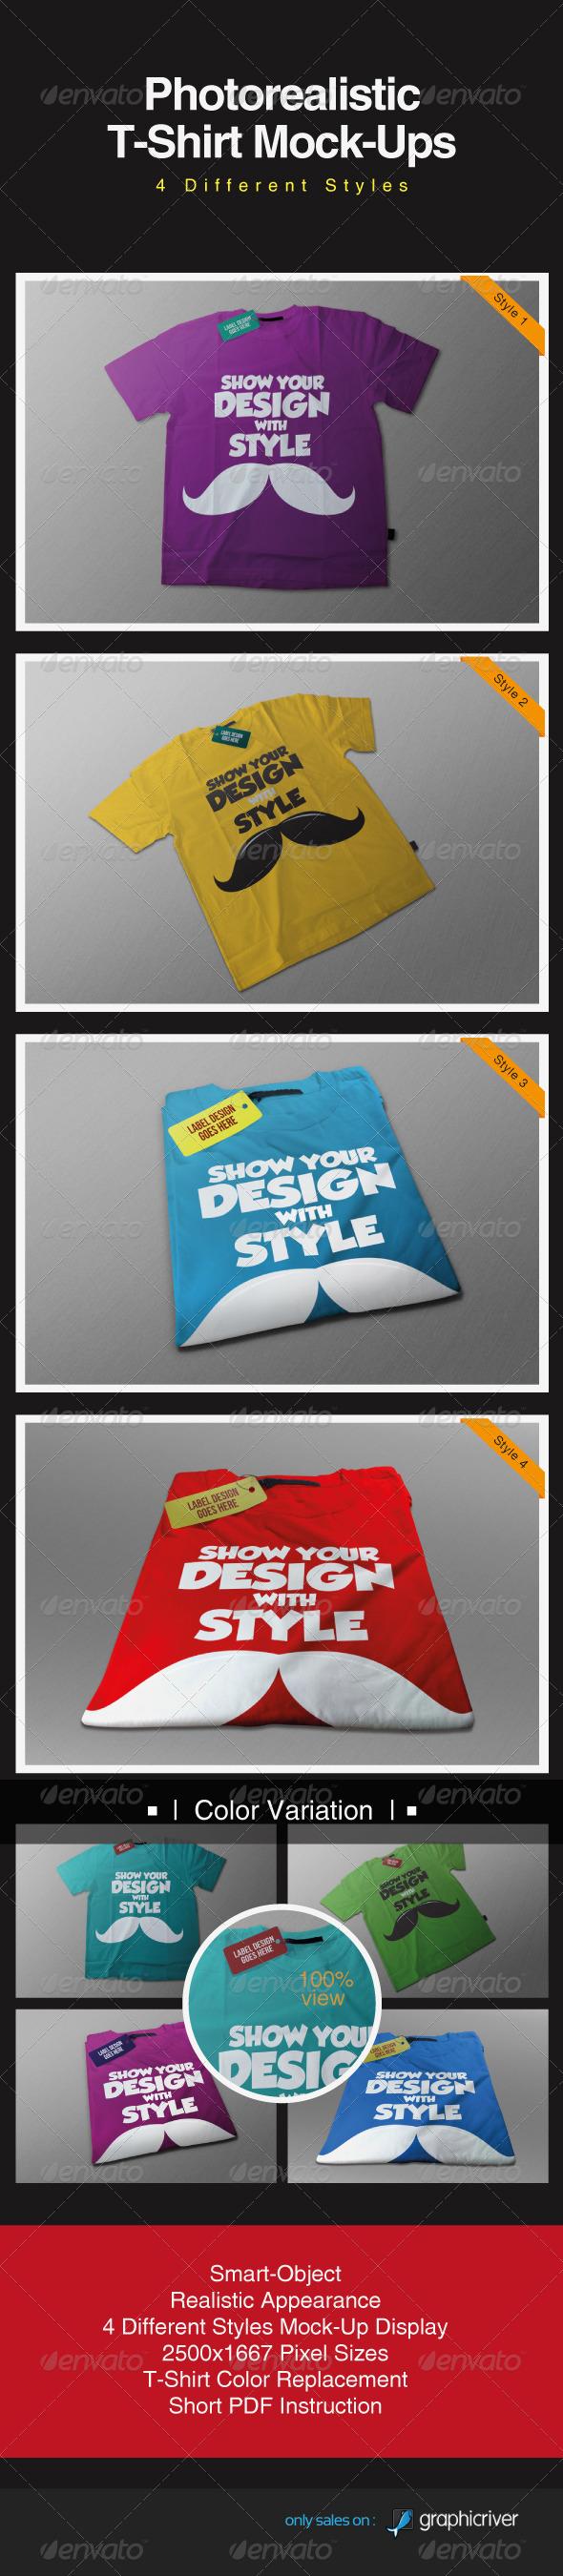 GraphicRiver Photorealistic T-Shirt Mock-Ups 3201358